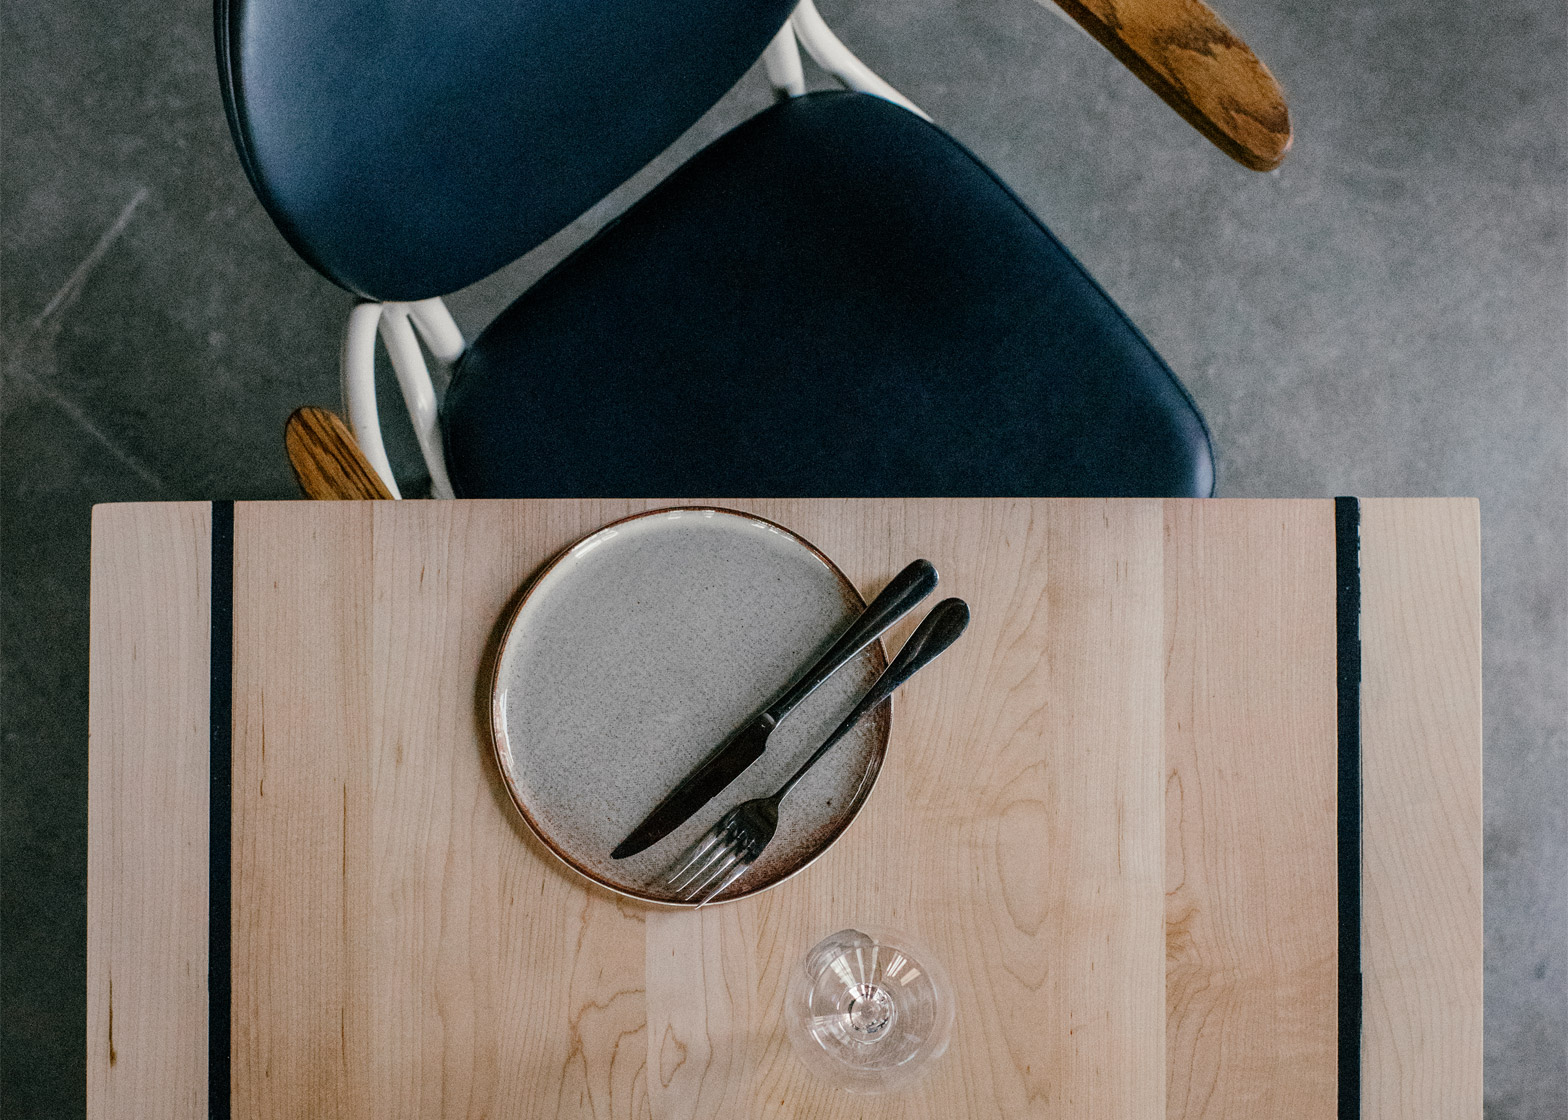 08-restaurante-montreal-antiga-fabrica-transformacao